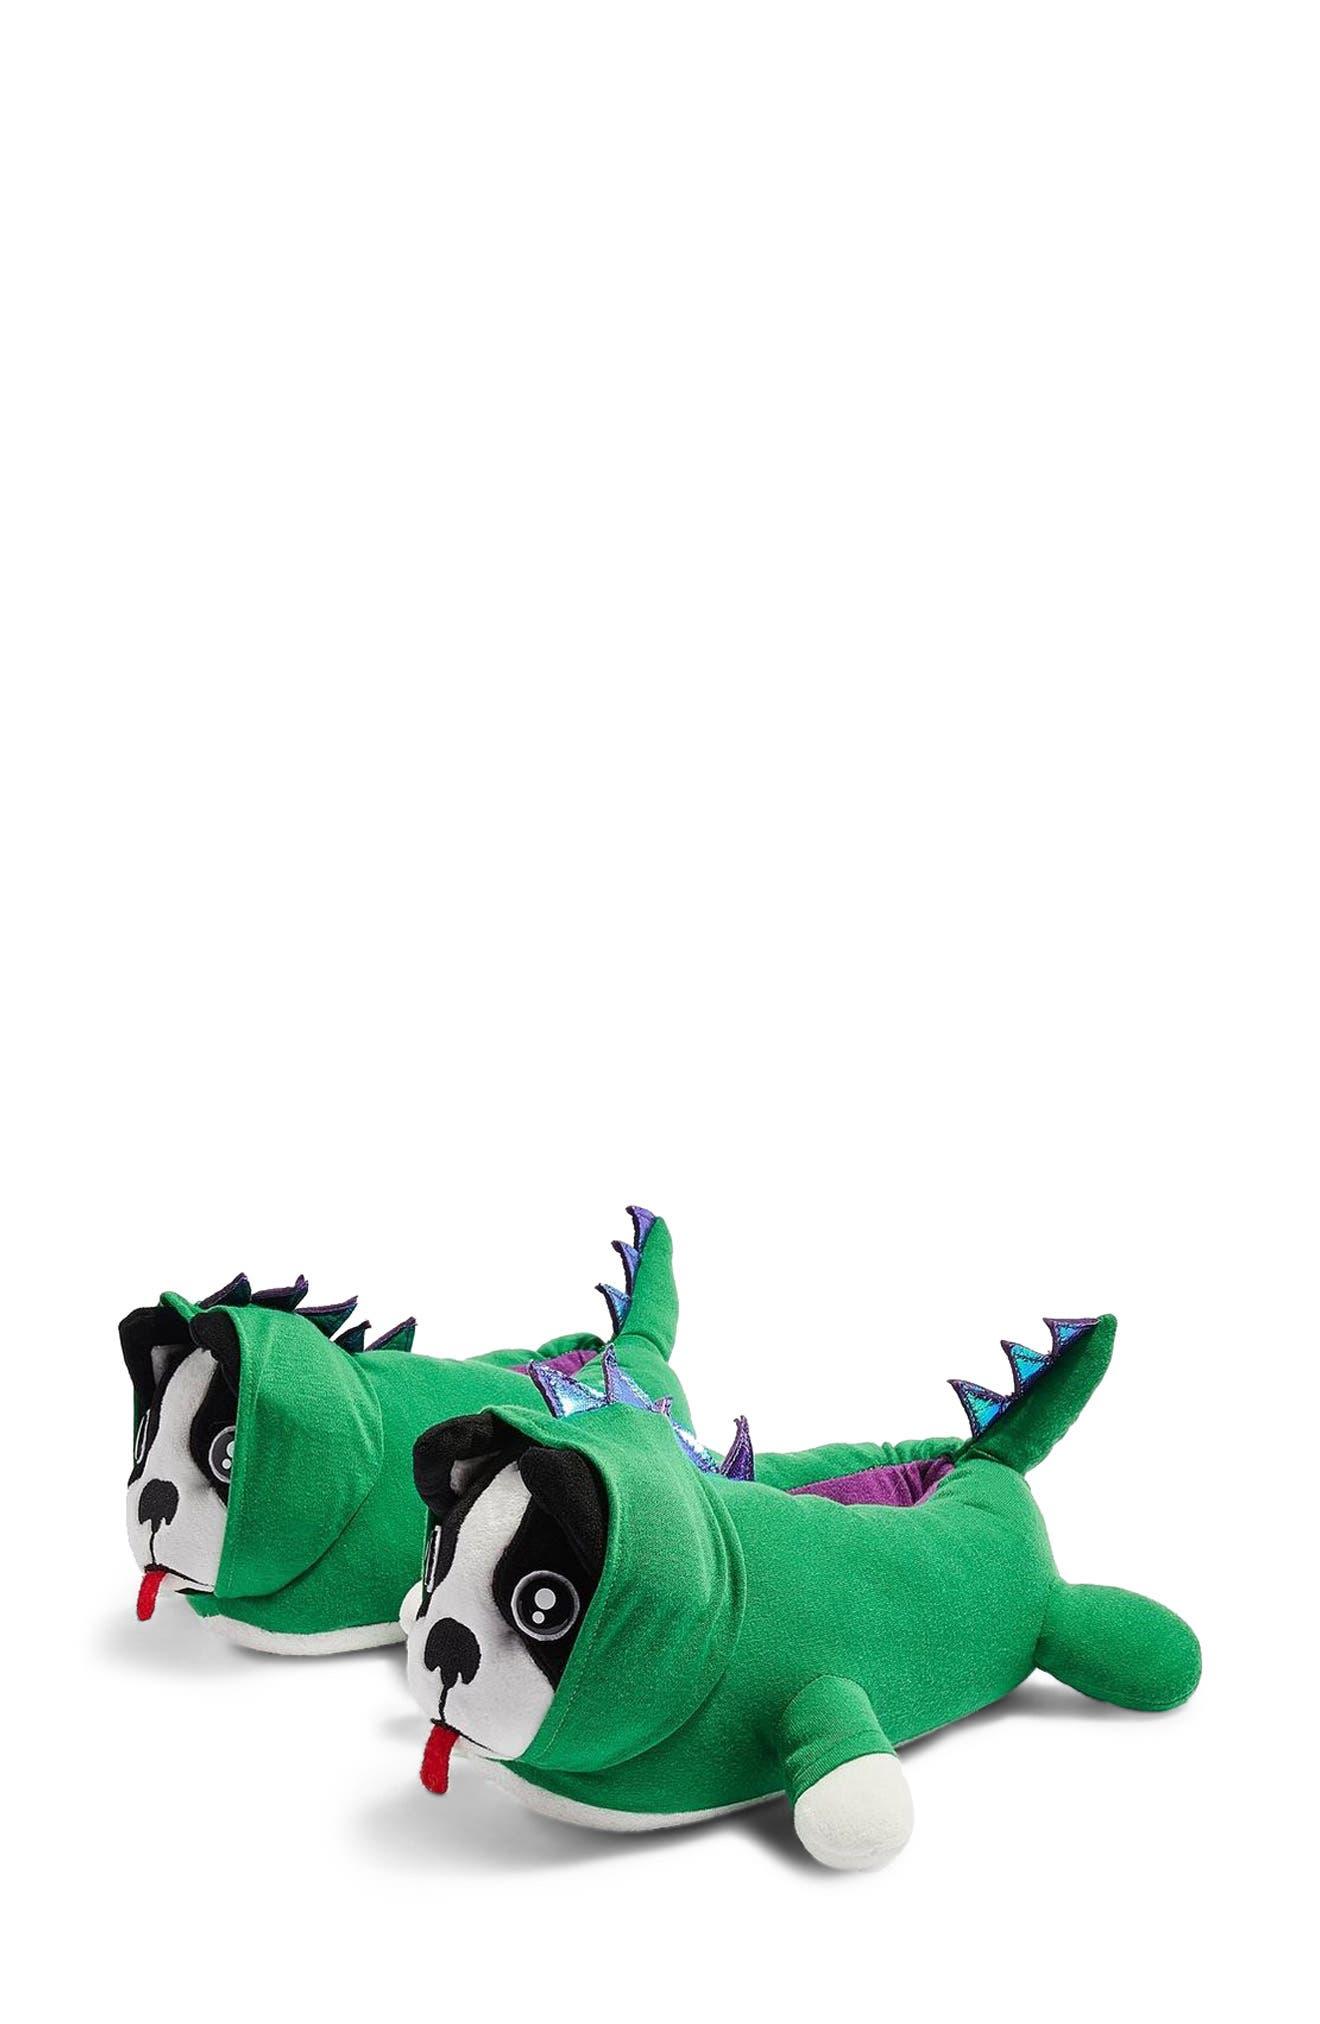 Dino Dog Slippers,                             Main thumbnail 1, color,                             300